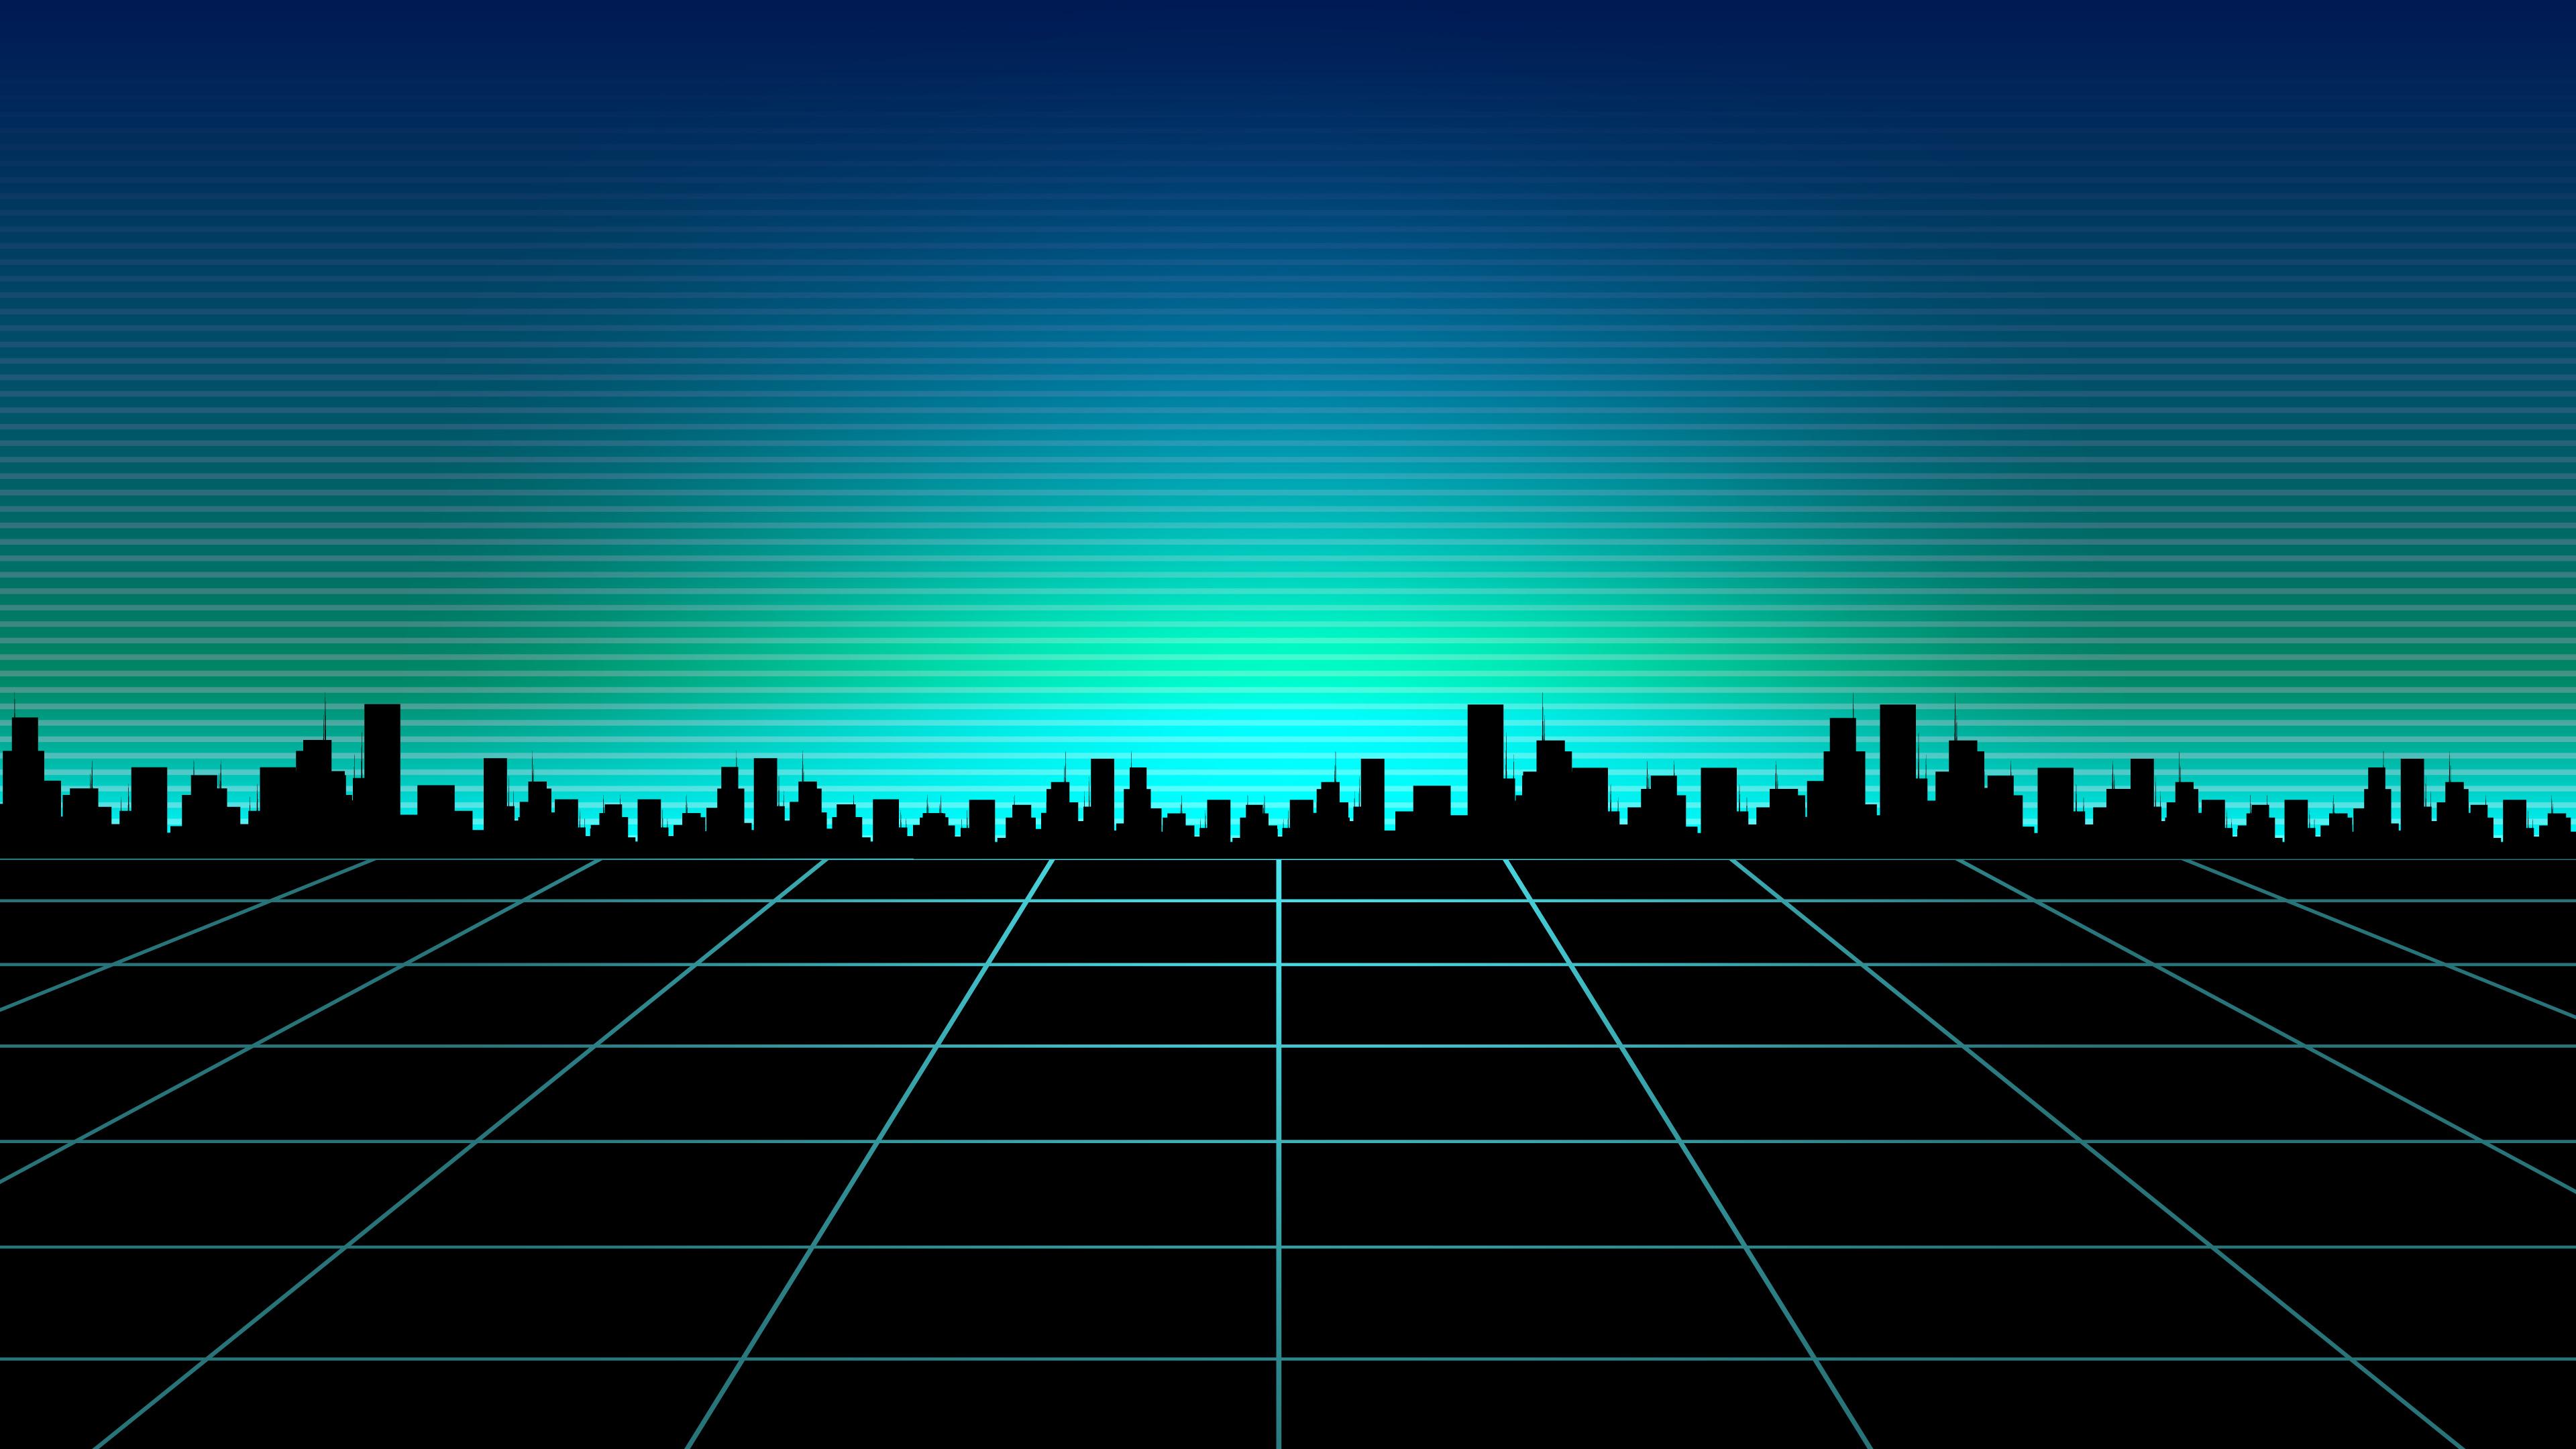 retro-wave-path-to-buildings-4k-ml.jpg